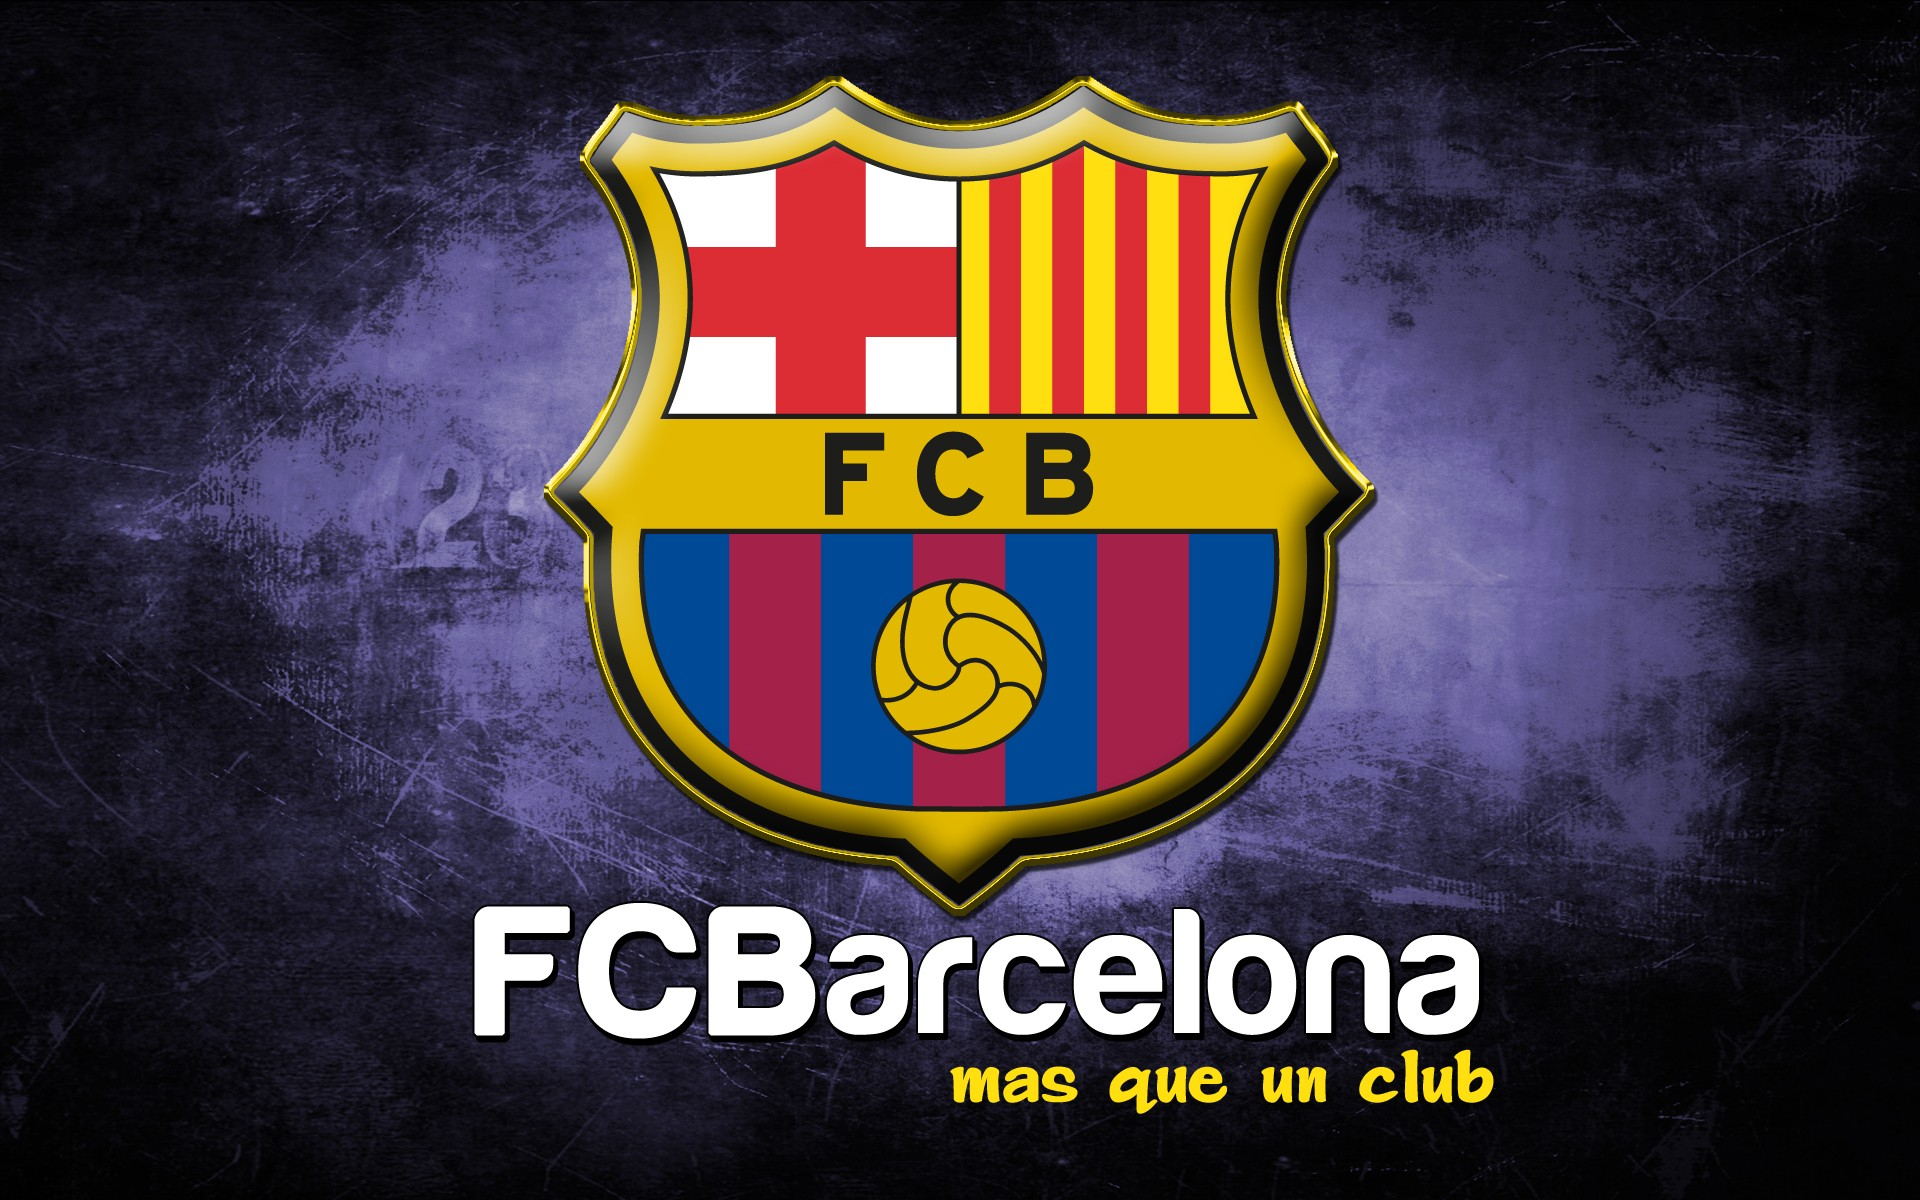 FC Barcelona - 1920x1200